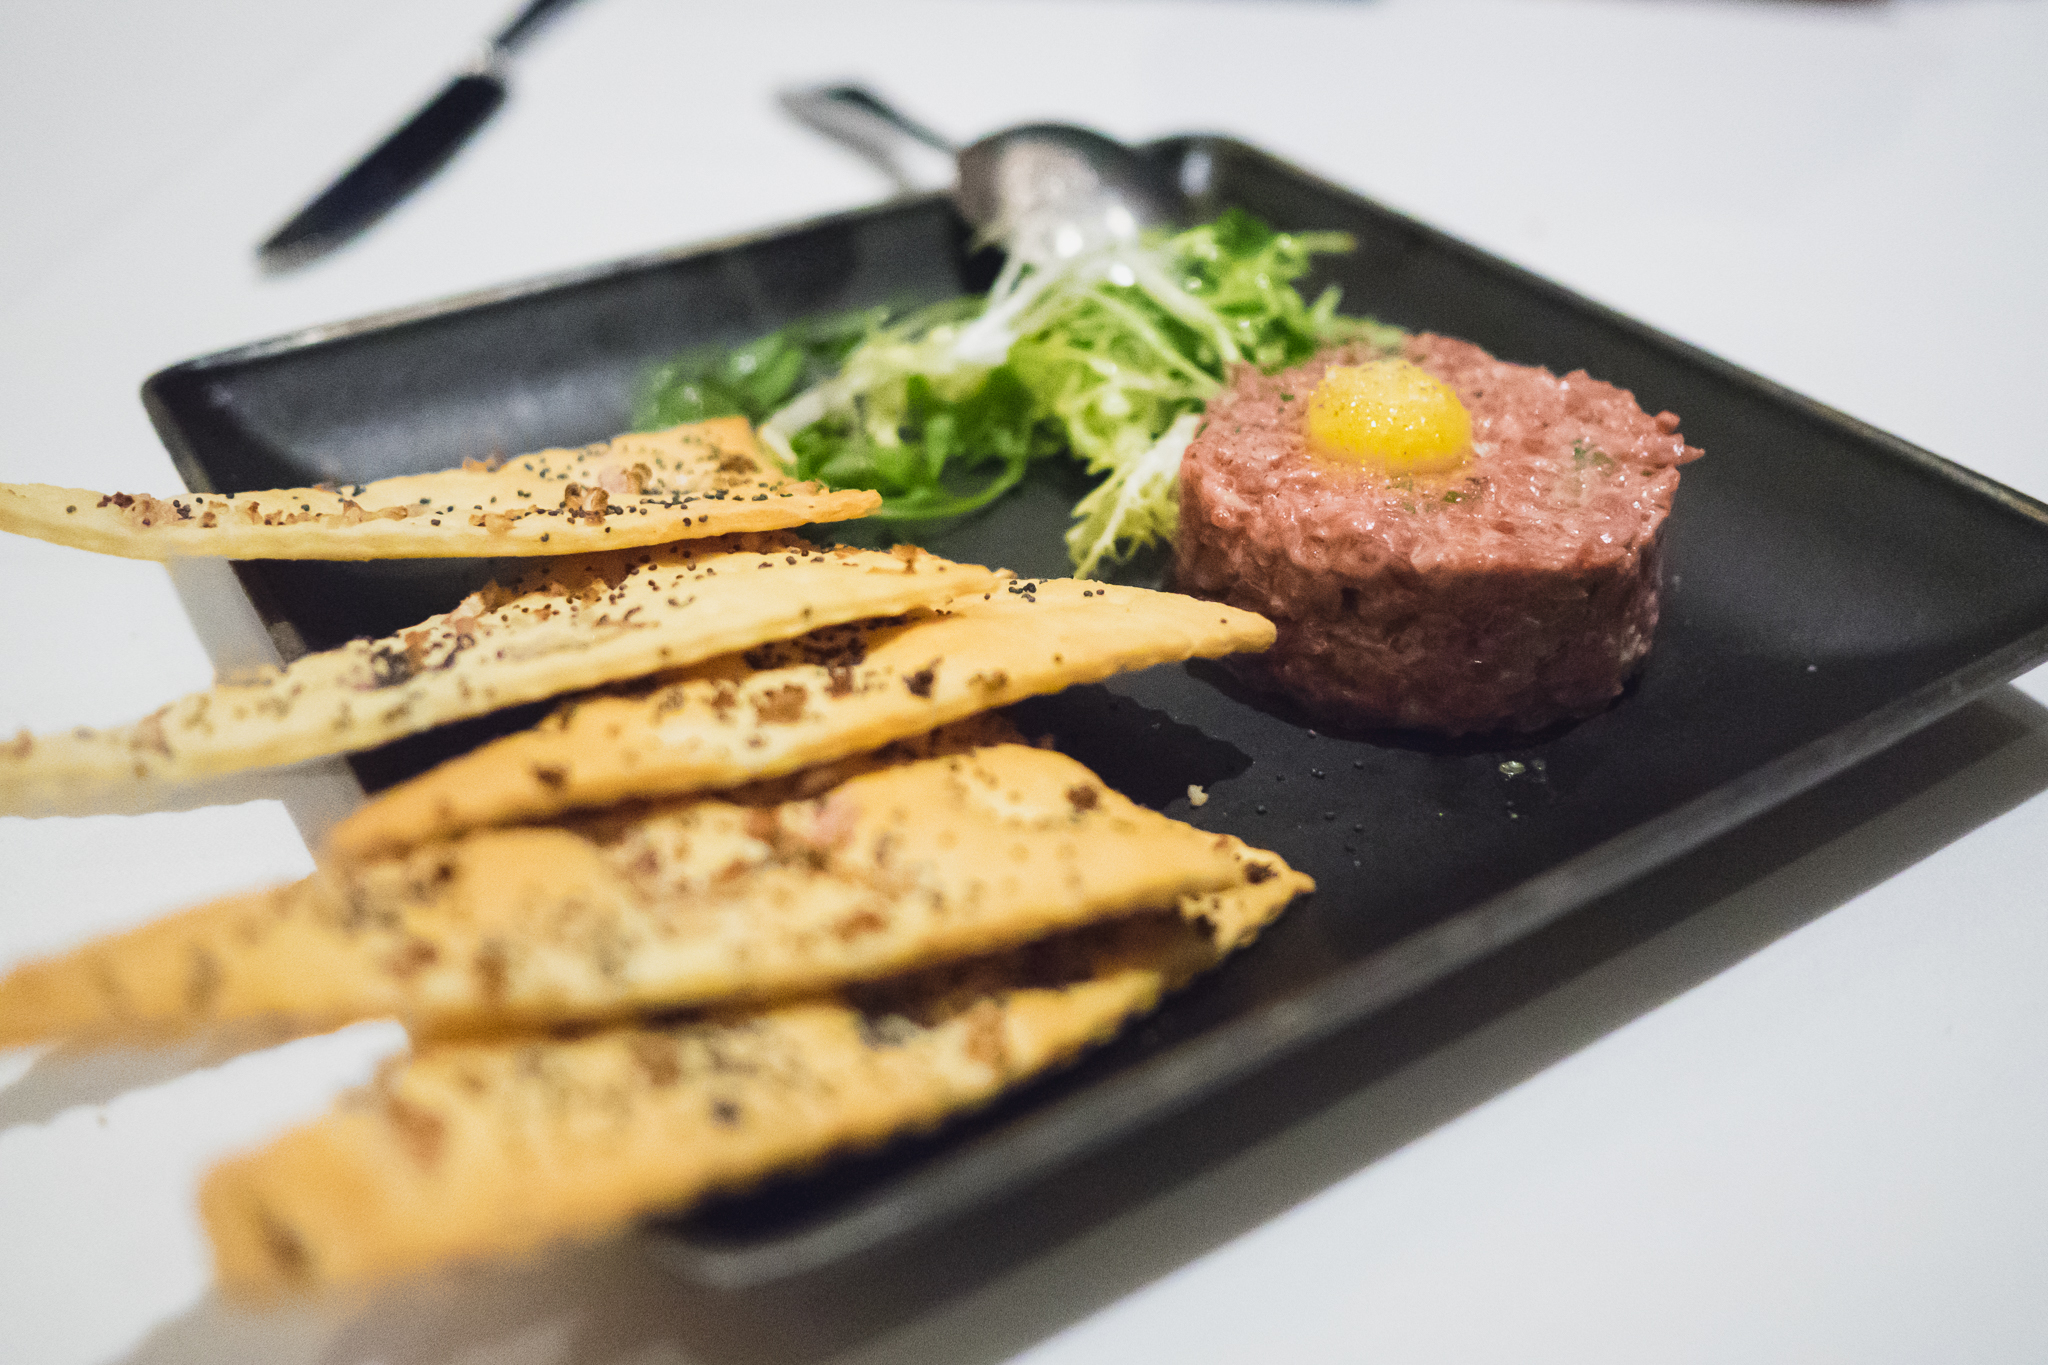 montana wagyu steak tartare  with capers, cornichons, aioli, crackers.